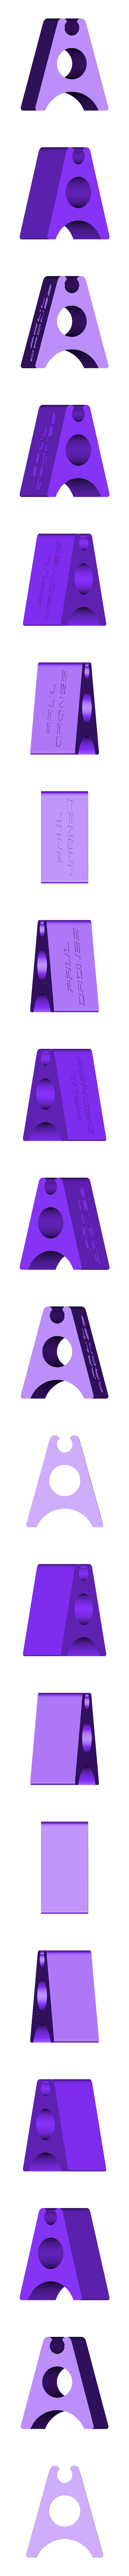 protector_apoyo_crossfire_10mm.asa.obj Download free OBJ file Soporte protector para modulo TX Crossfire (Horus 10) • 3D print design, PaulDrones